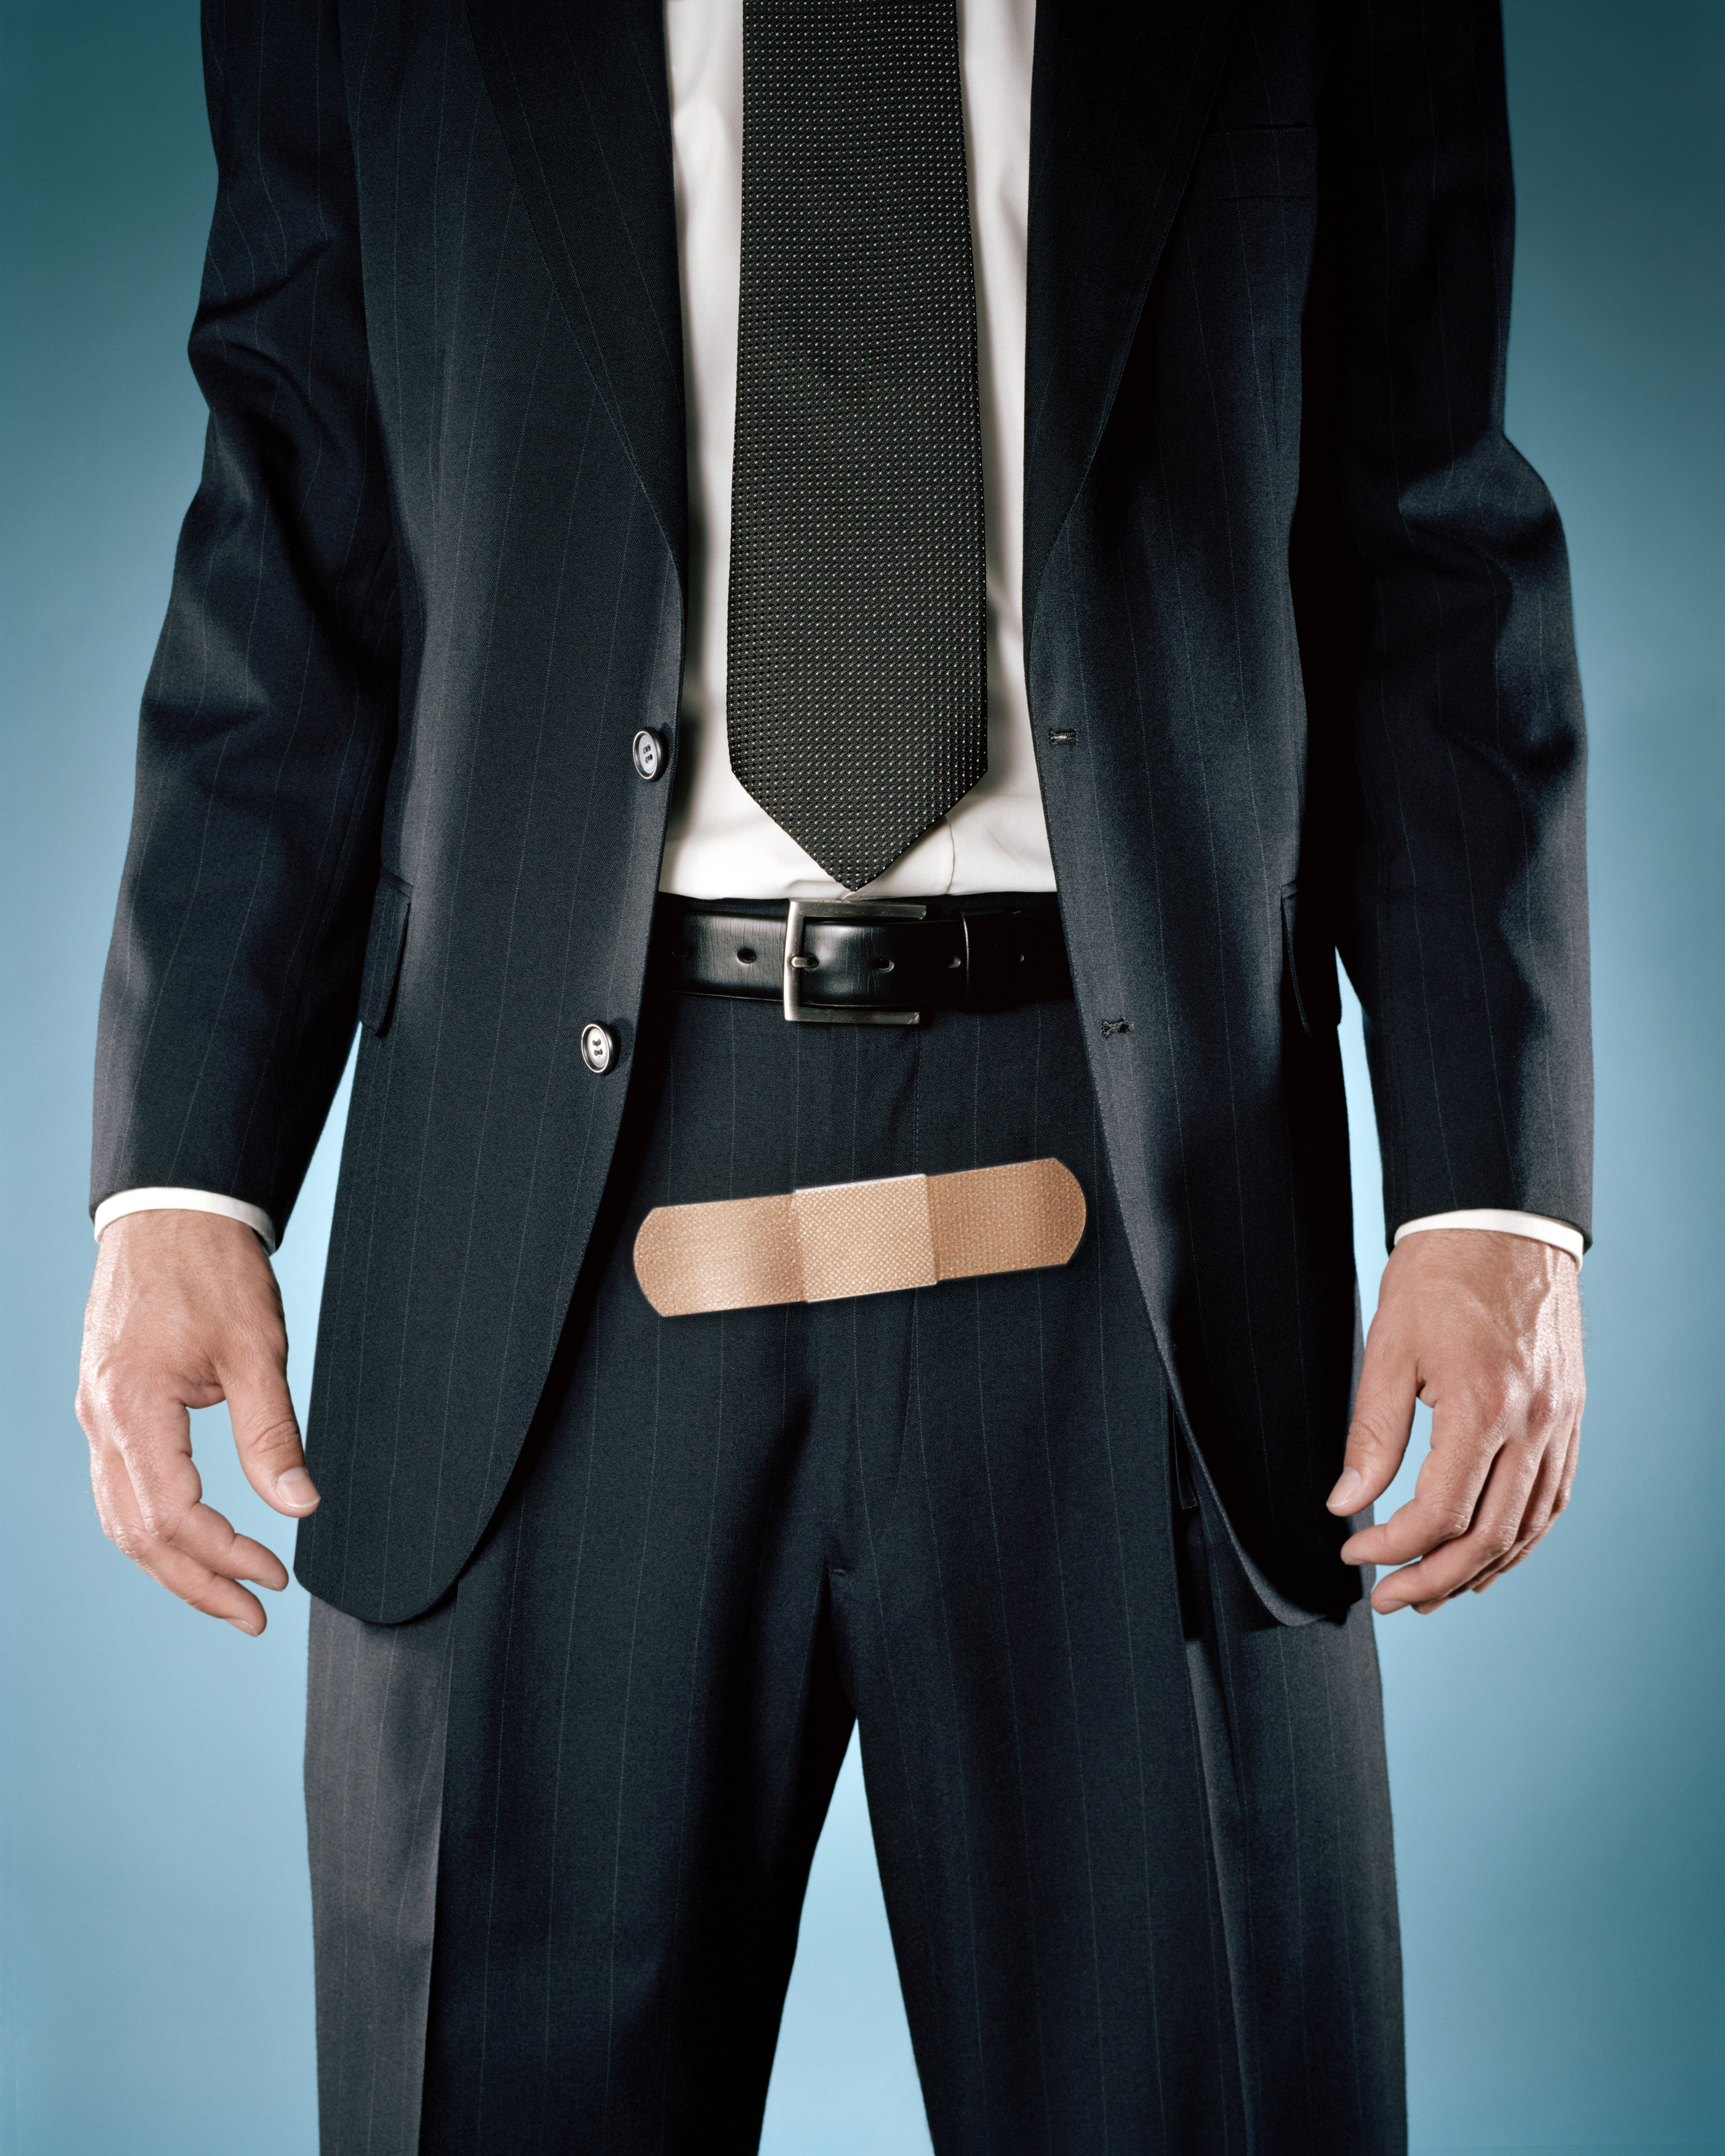 businessman with bandage on zipper